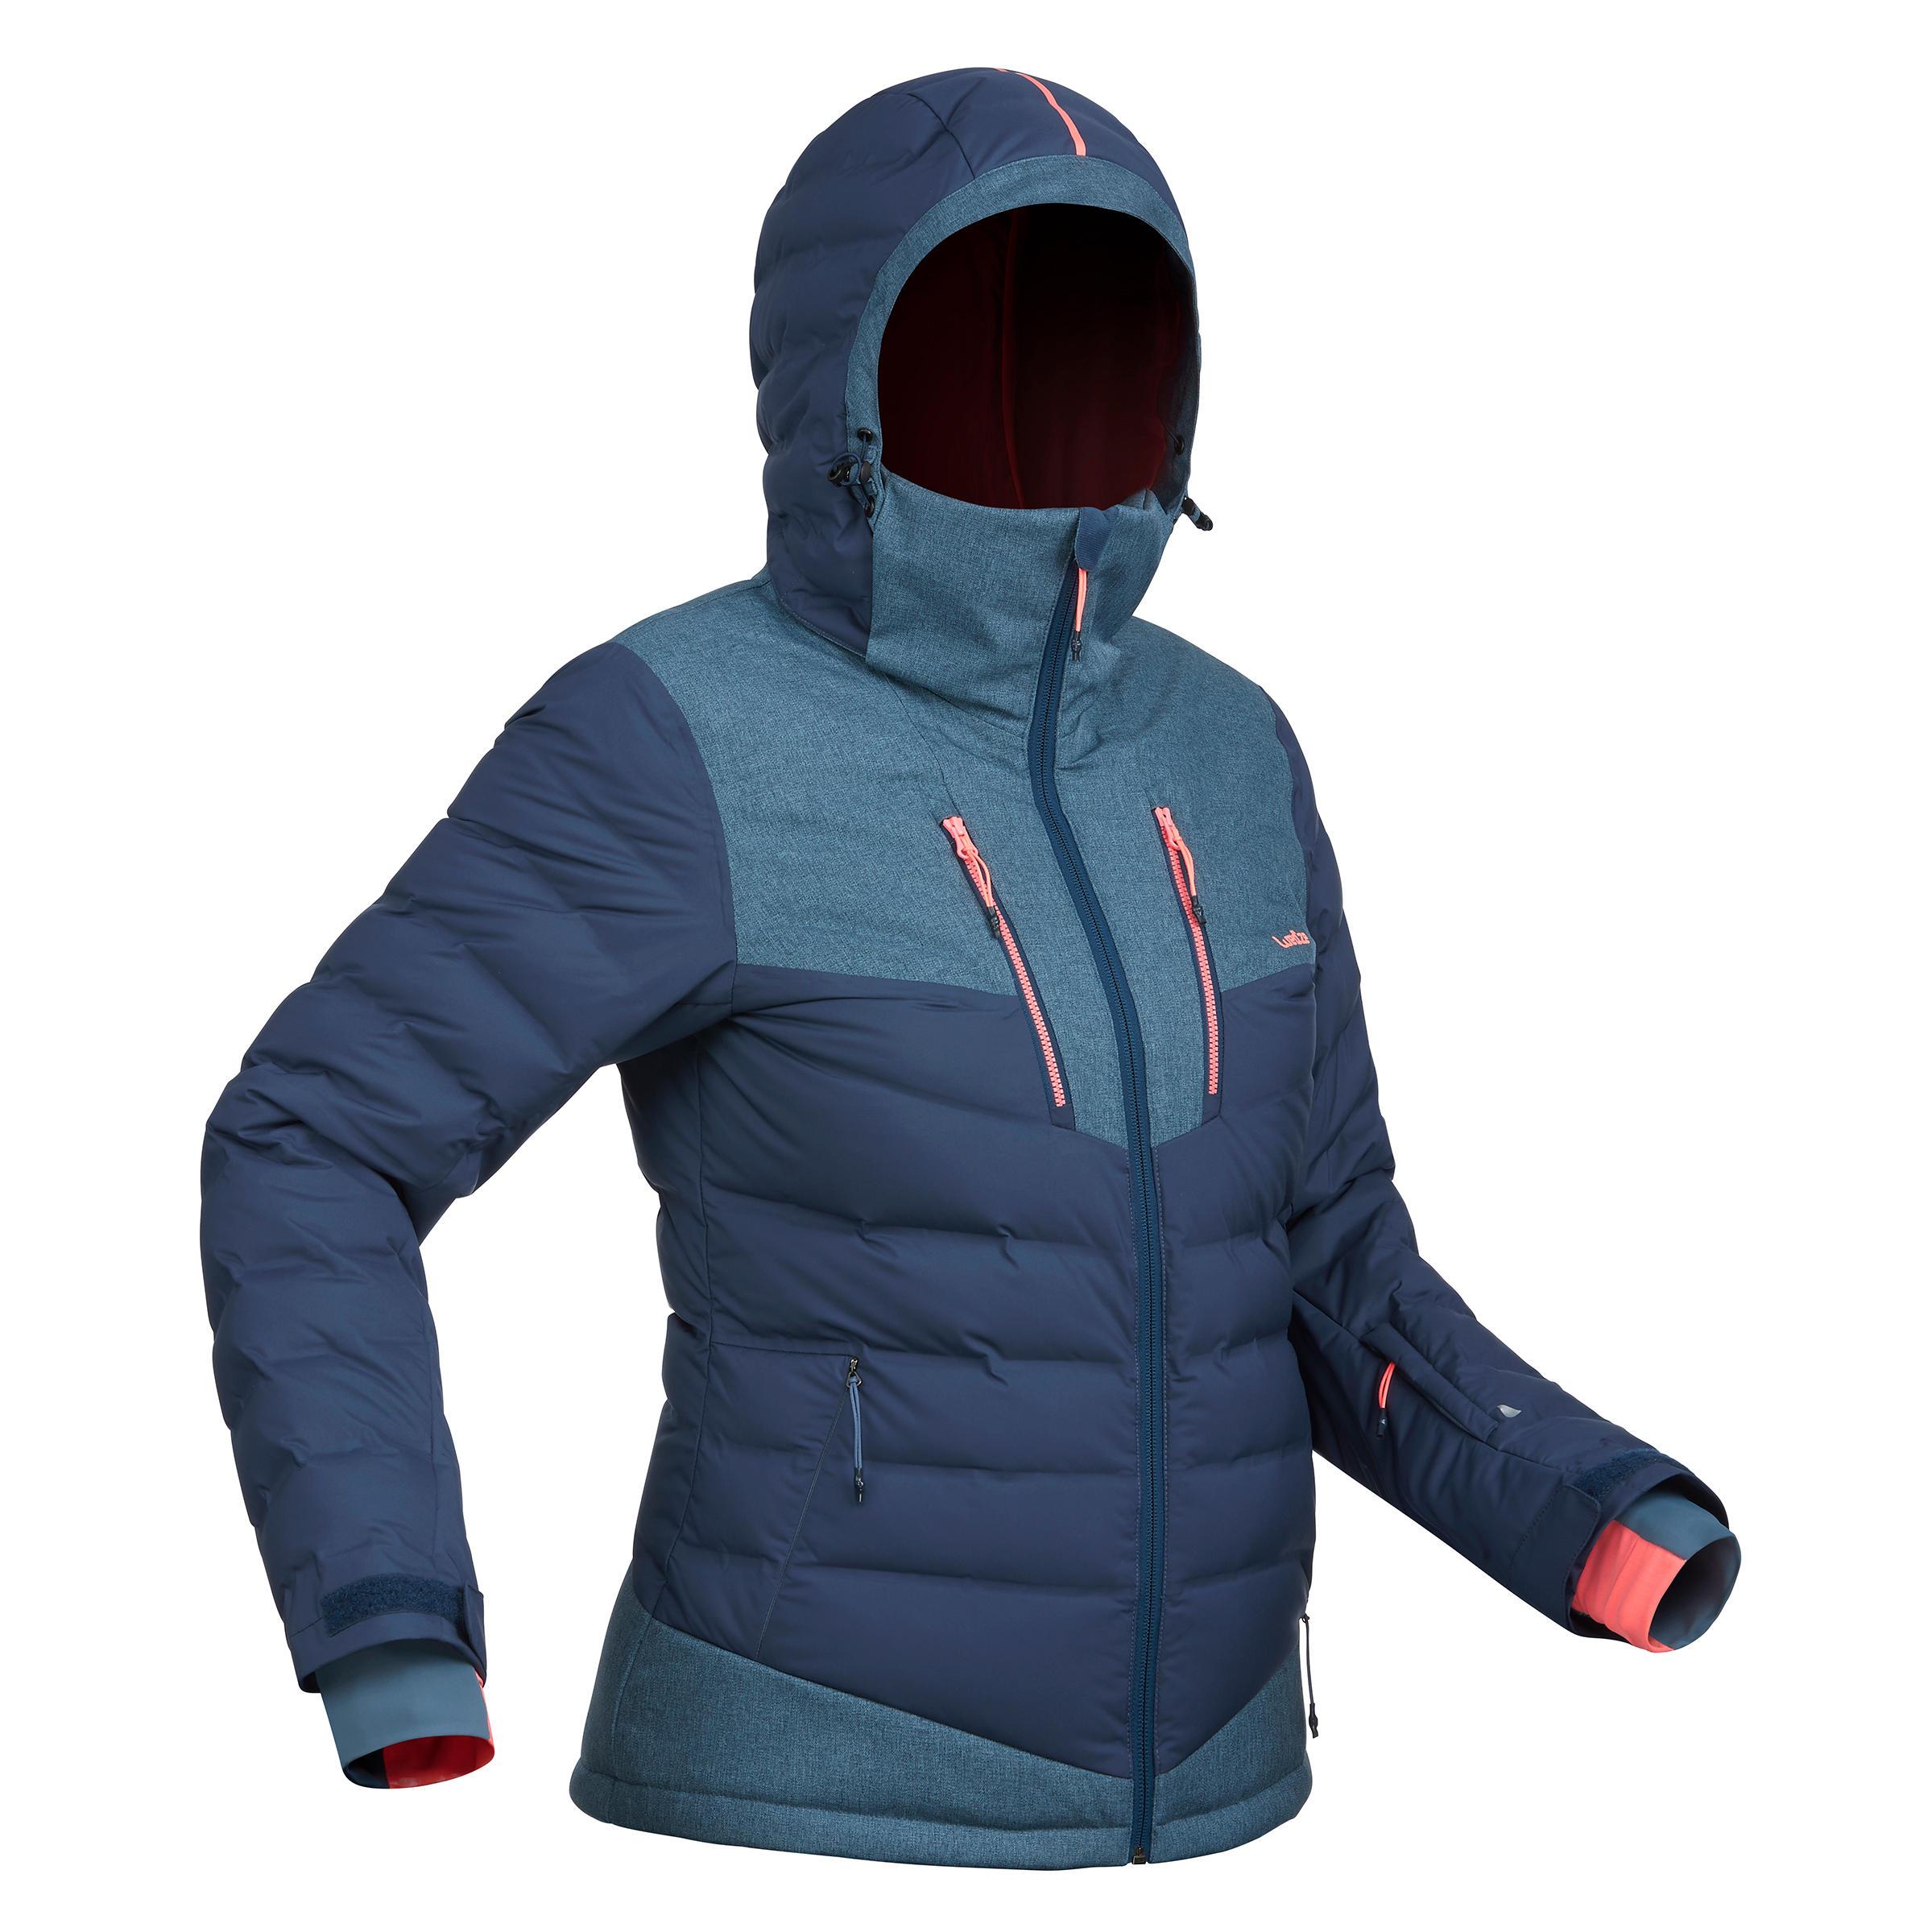 Skijacke Piste 900 Warm Damen blau   Sportbekleidung > Sportjacken > Skijacken   Blau   Wed'ze